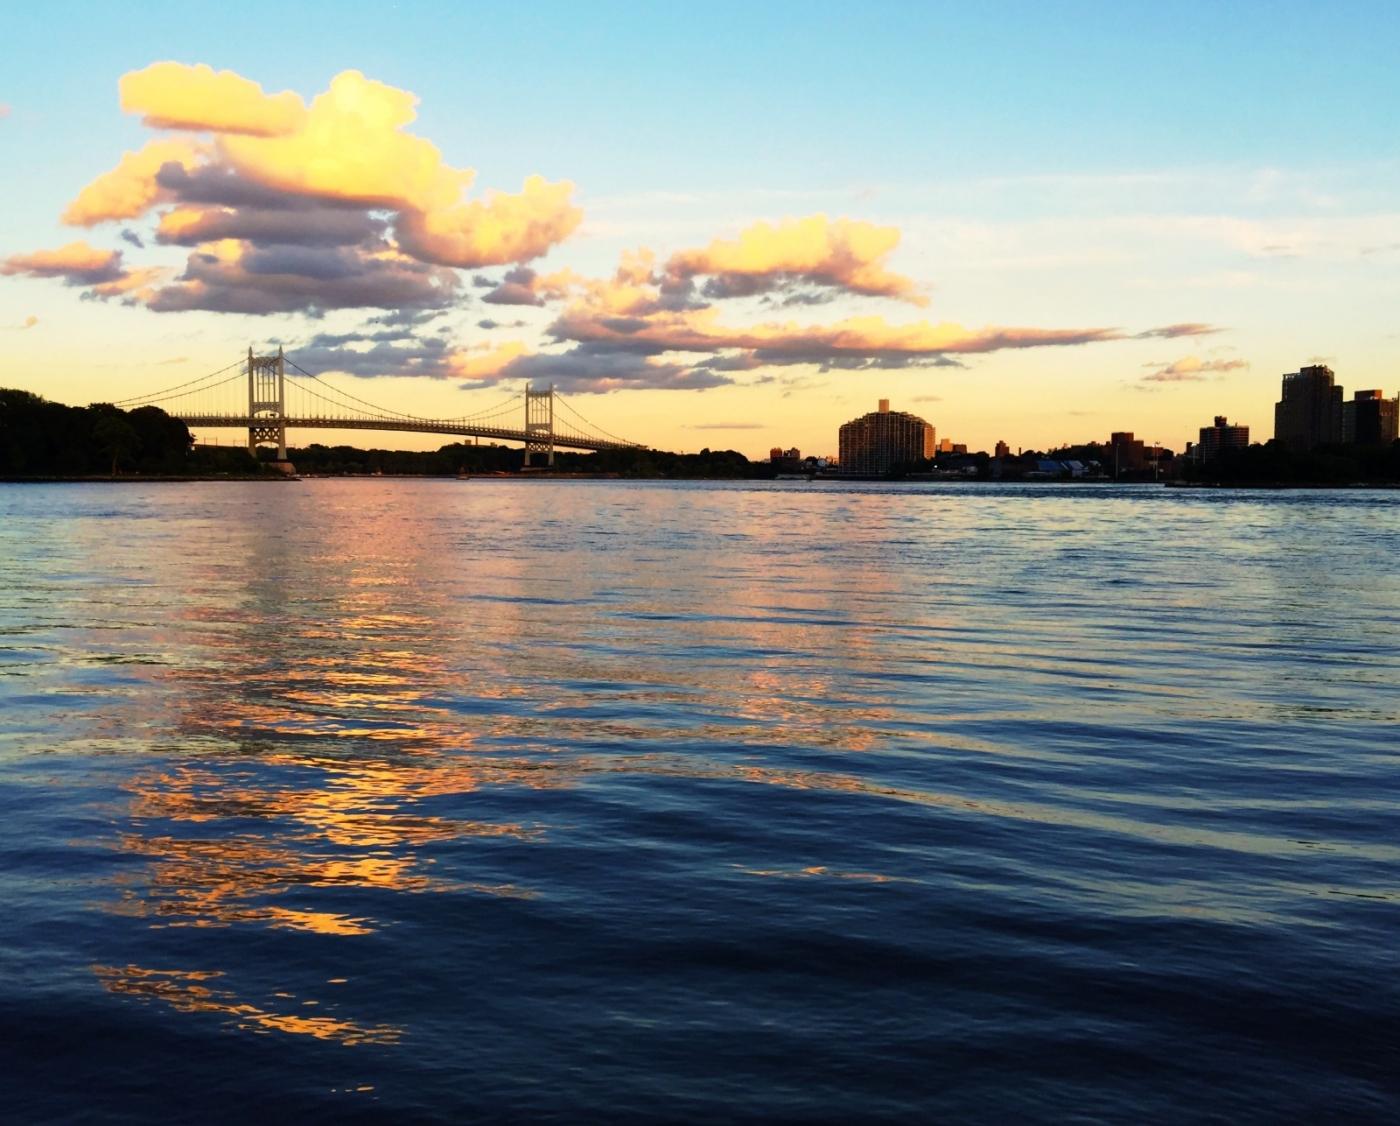 回头一瞅 美在东河 Manhattan East River_图1-22